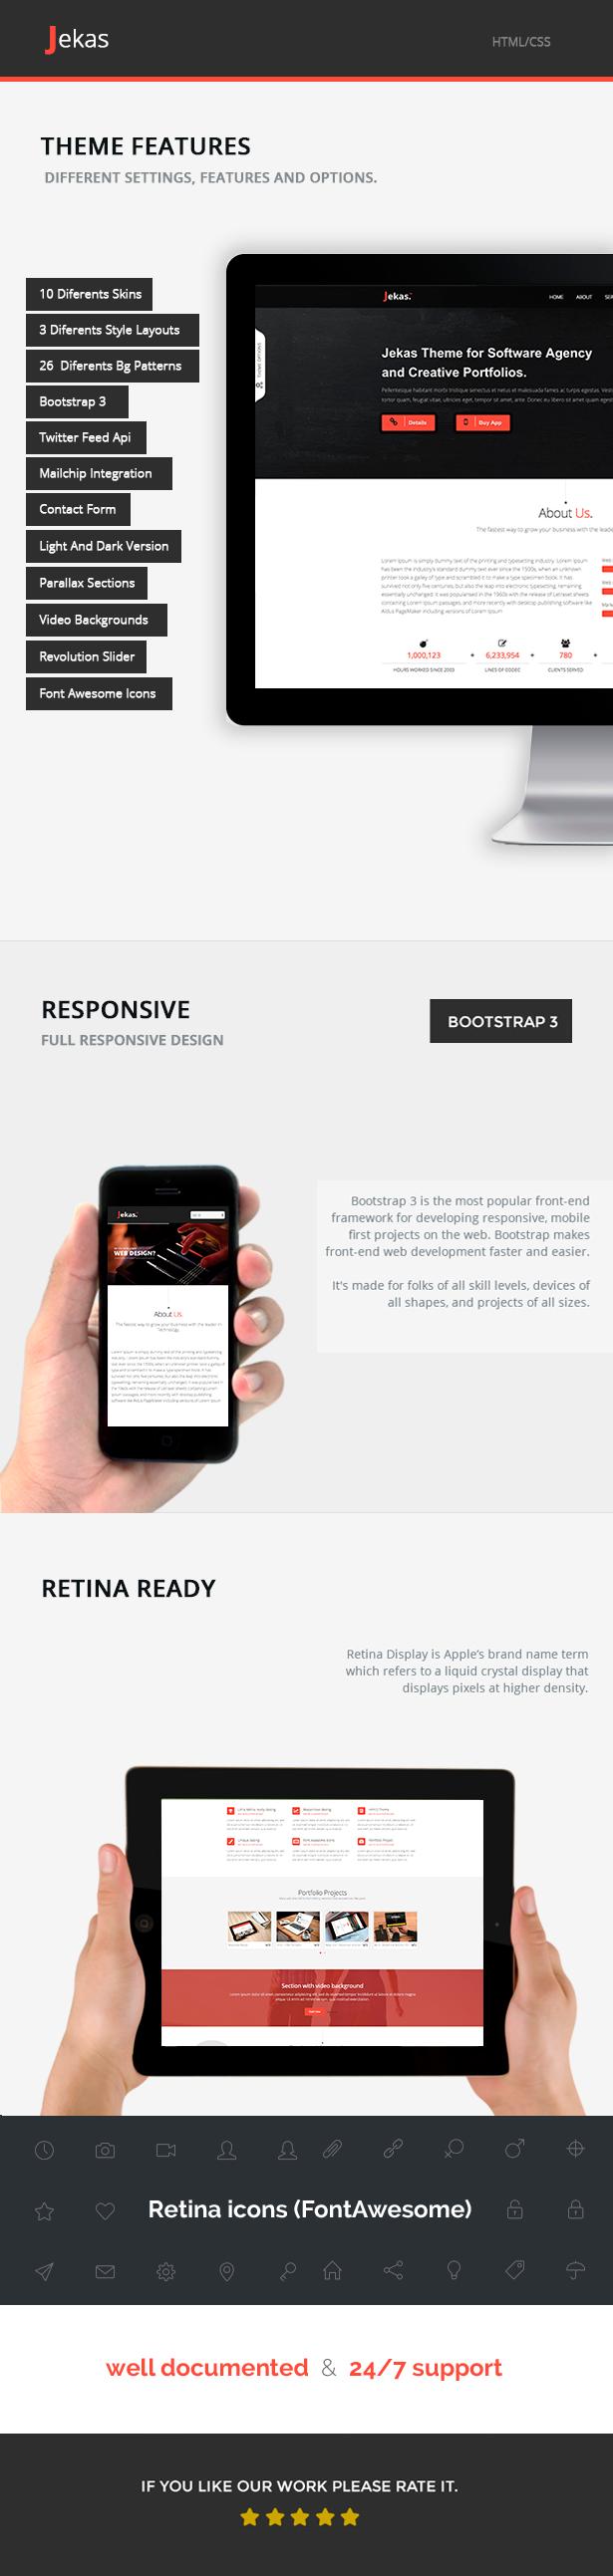 jekas - Software, Technology & Business Bootstrap Html Template - Jekas